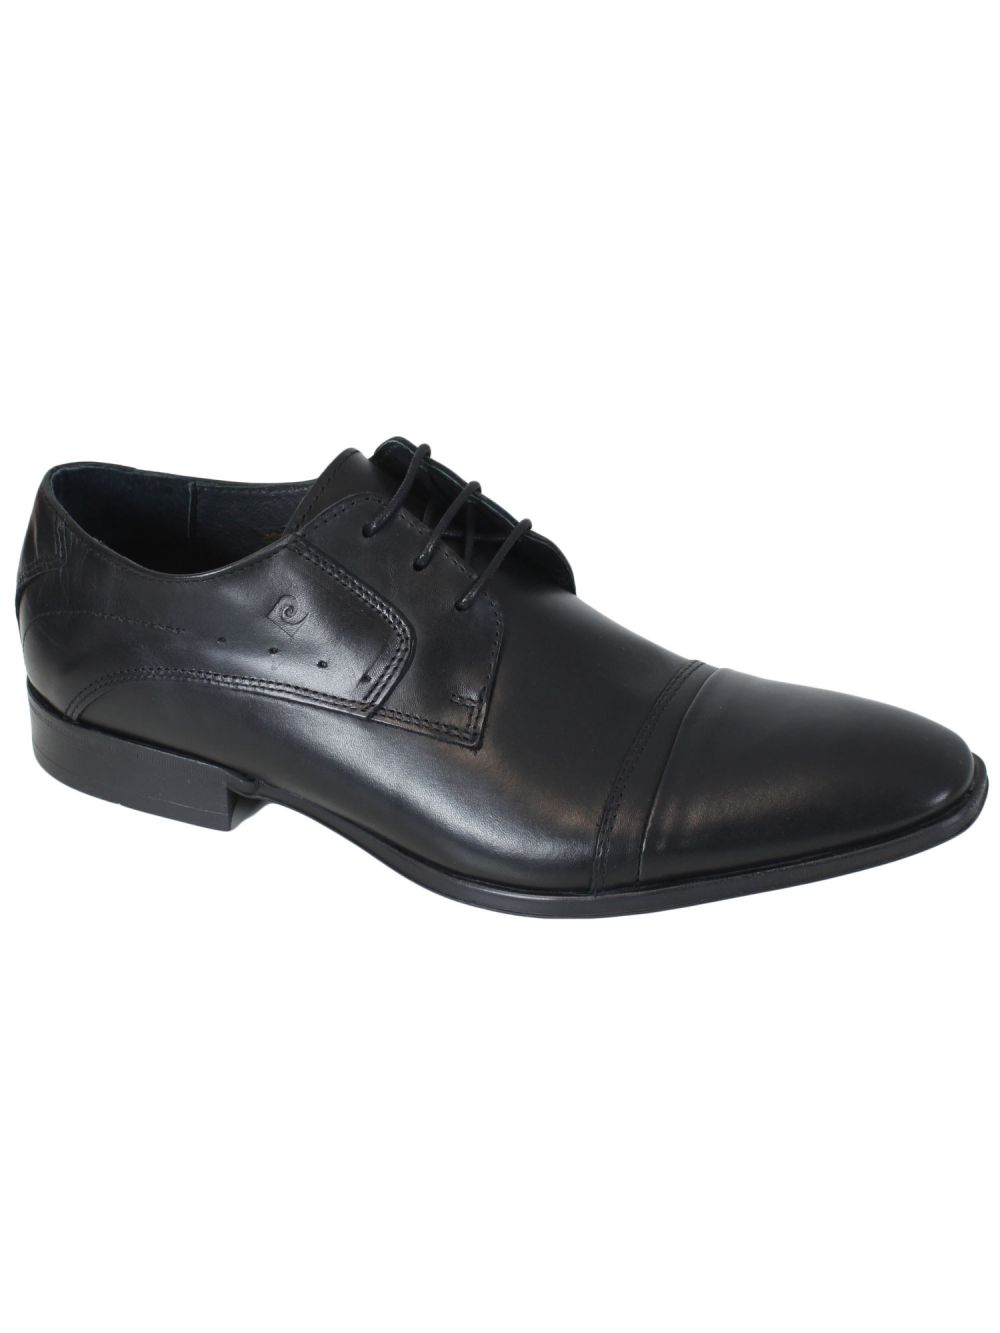 Chaussures Pierre Cardin en cuir Biro